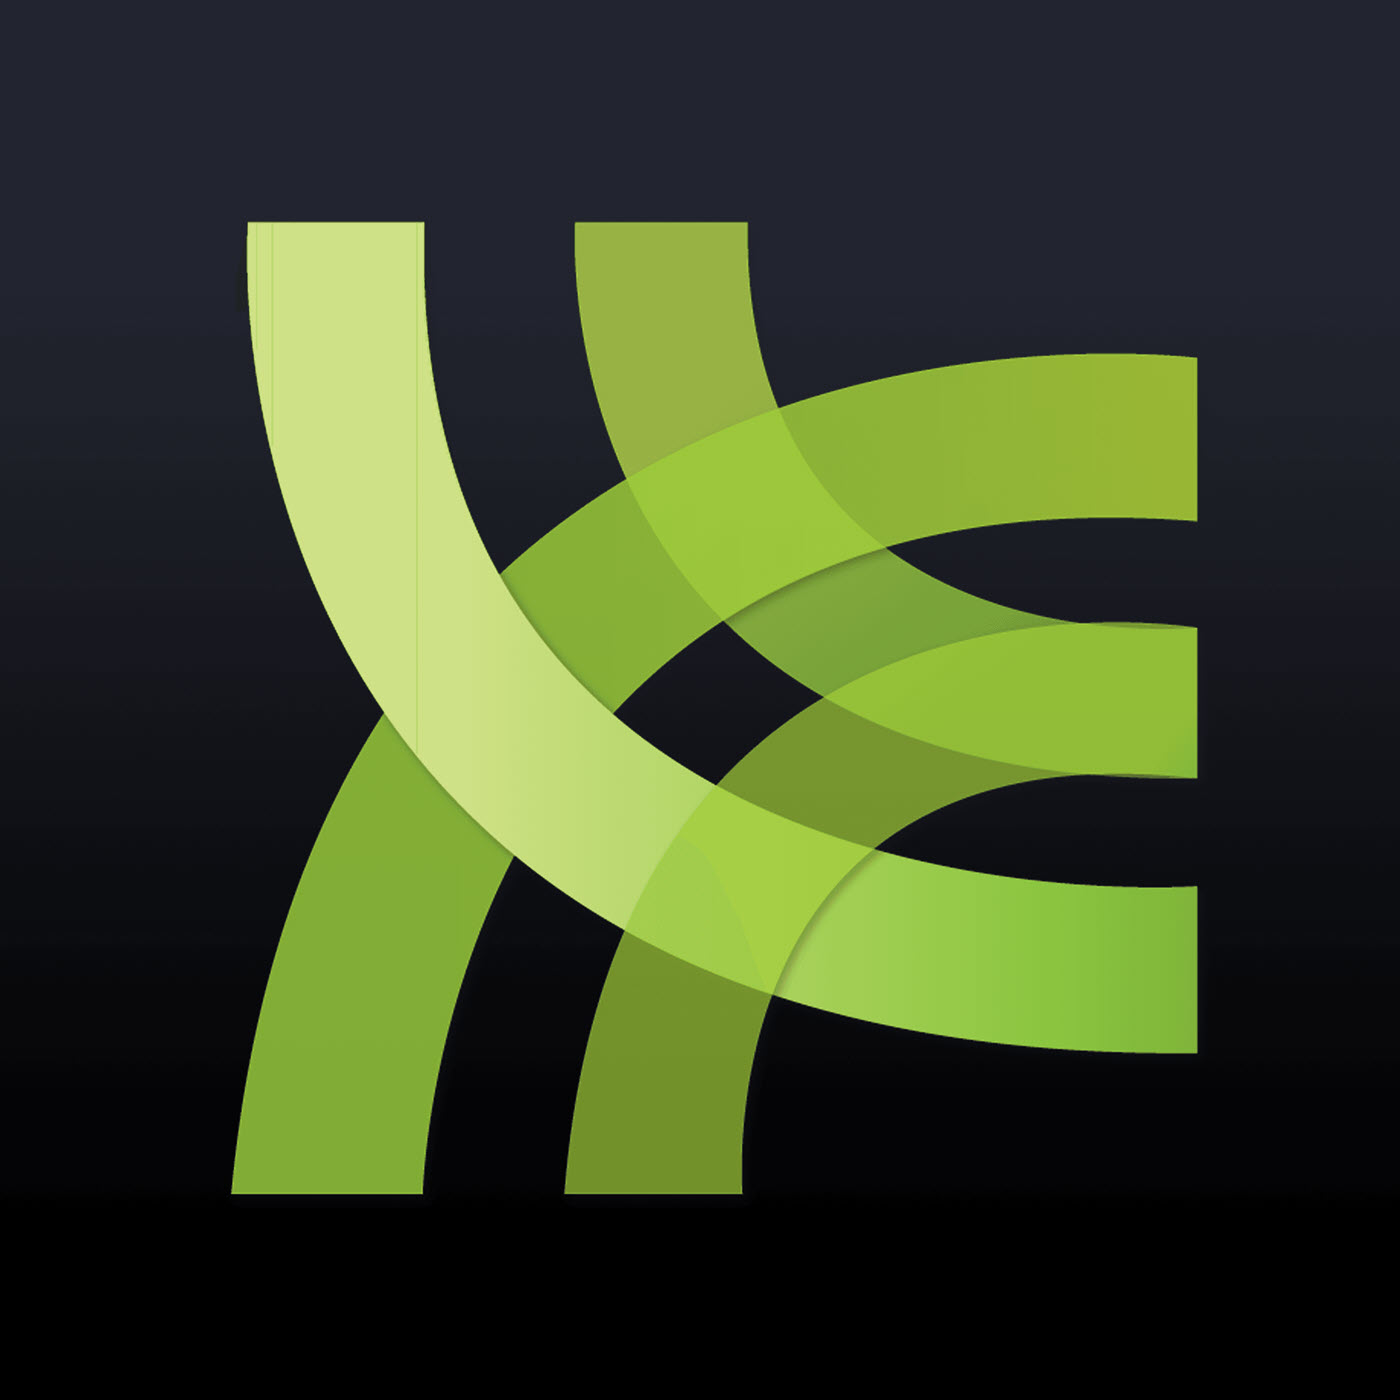 http://homedir-a.libsyn.com/podcasts/3d0d8d5ef08a1d5282c481d03bf7fefb/47f6762b/amberstar/images/Zencast-A.jpg